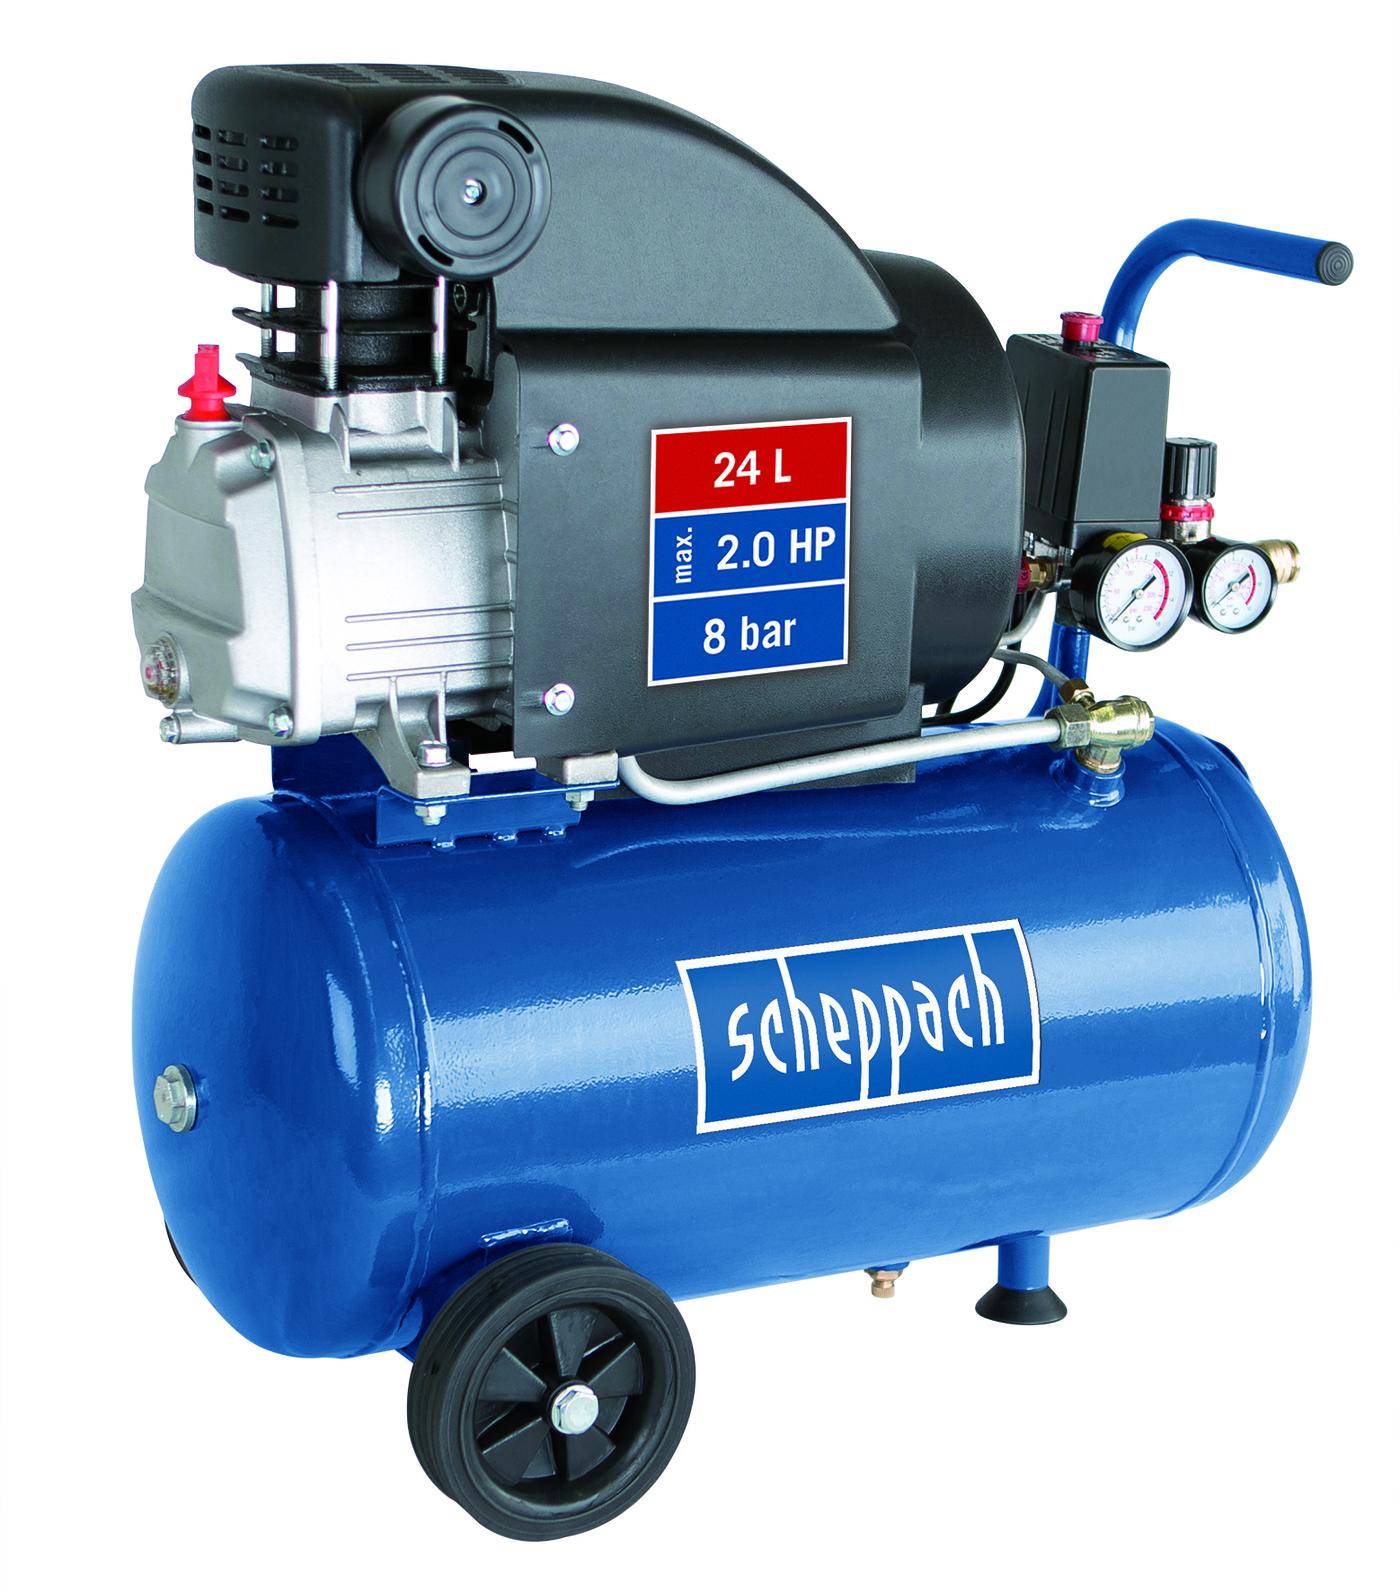 Kompresor olejový HC 25, 1500W, Scheppach